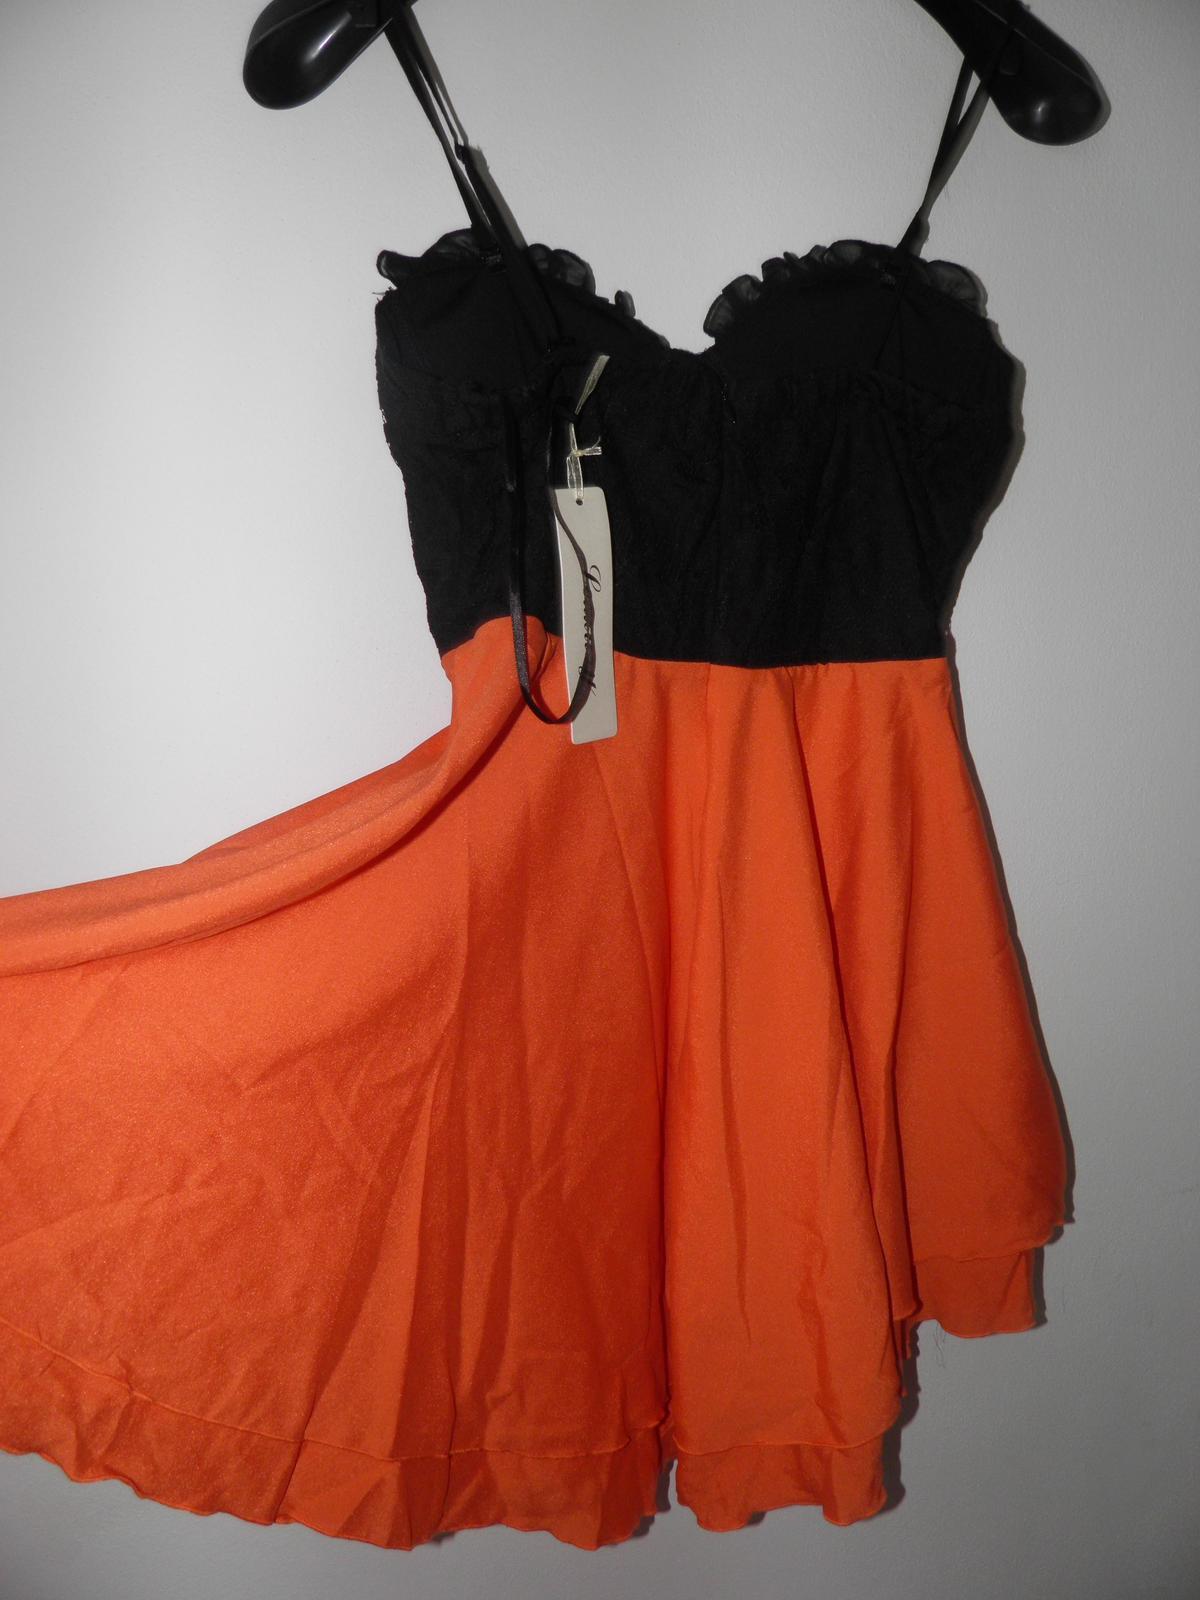 princeznovské šaty, nenosené s vísačkou M/L - Obrázok č. 2